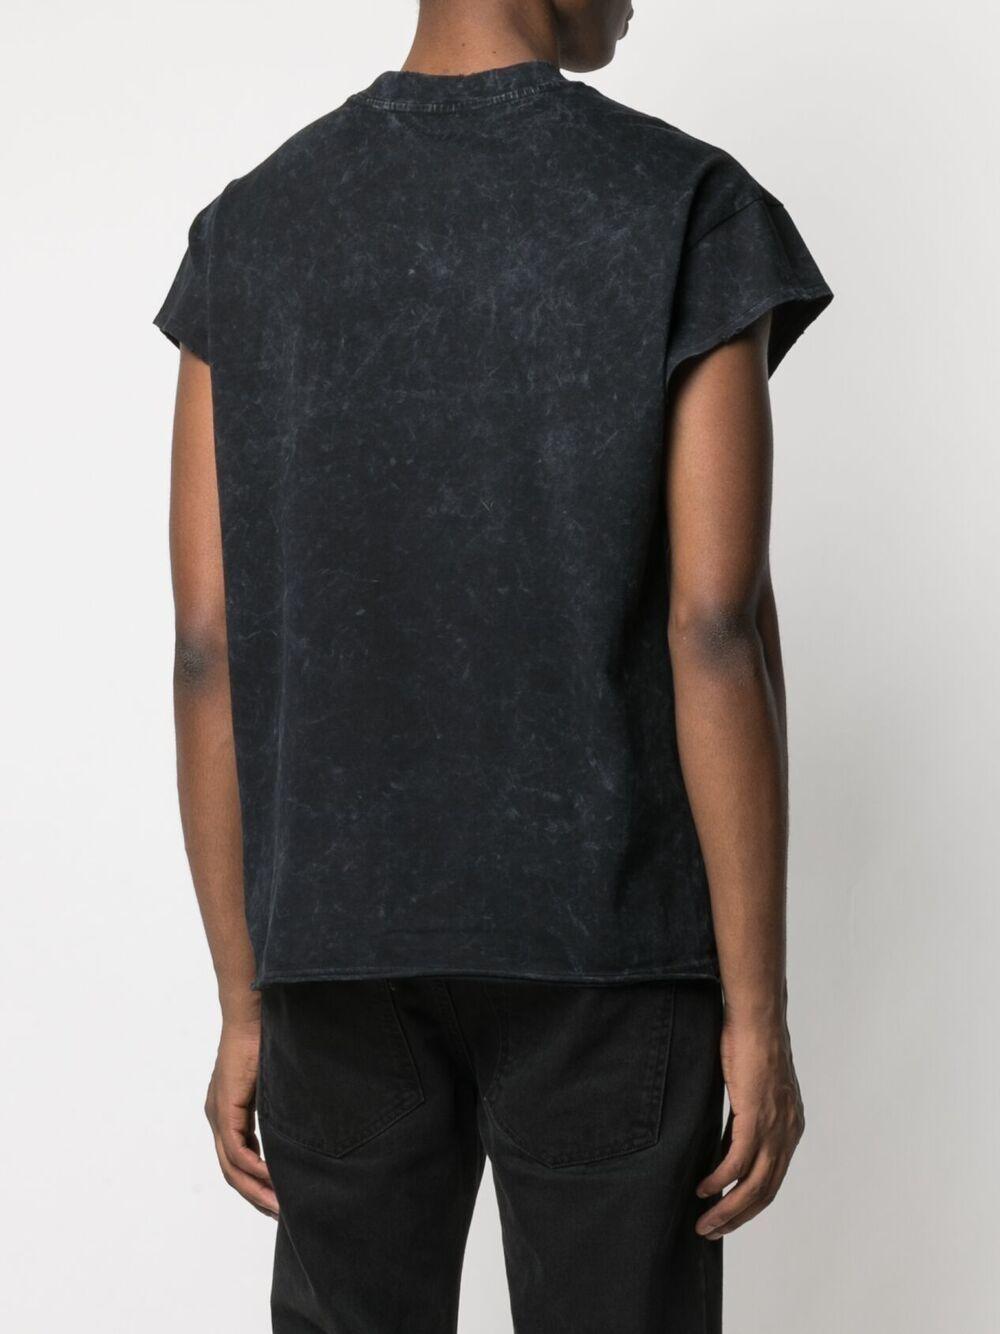 Print t-shirt black man cotton HONEY FUCKING DIJON | T-shirts | HFD03T004BLACK